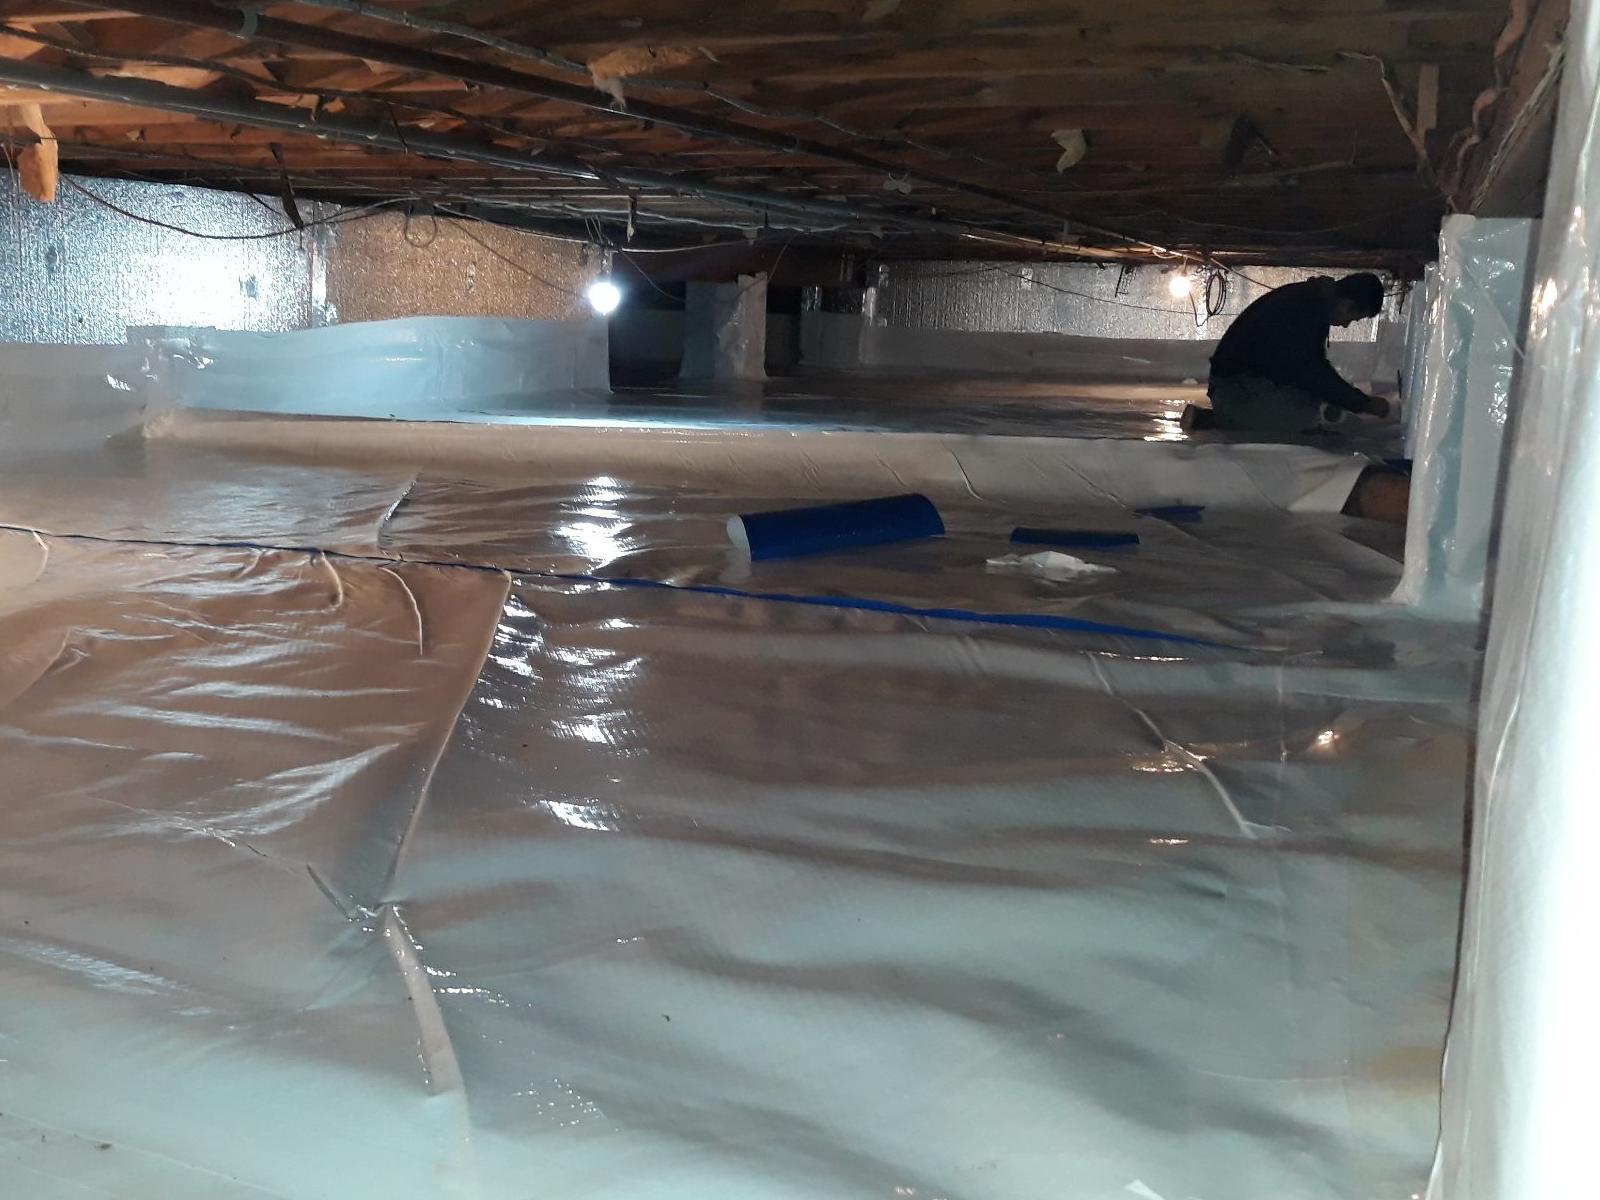 Even Cement Crawl Space Floors Get Wet - Hazlet, NJ - After Photo